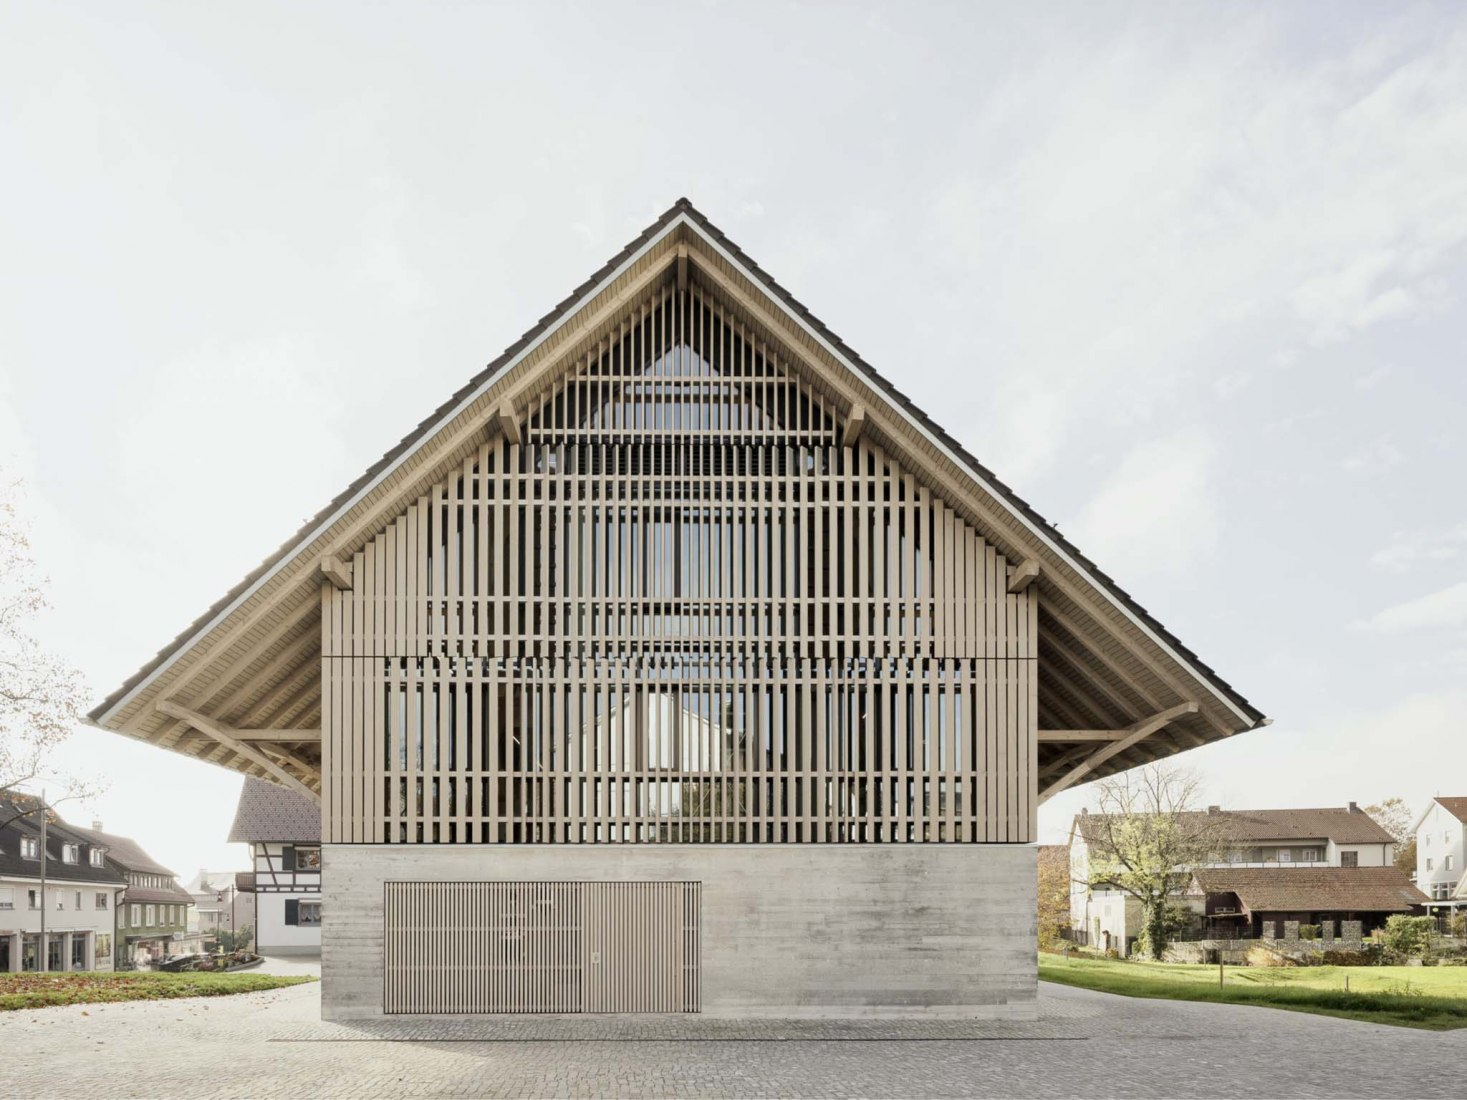 Bibliothek Kressbronn a.B por Steimle Architekten. Fotografía por Brigida González